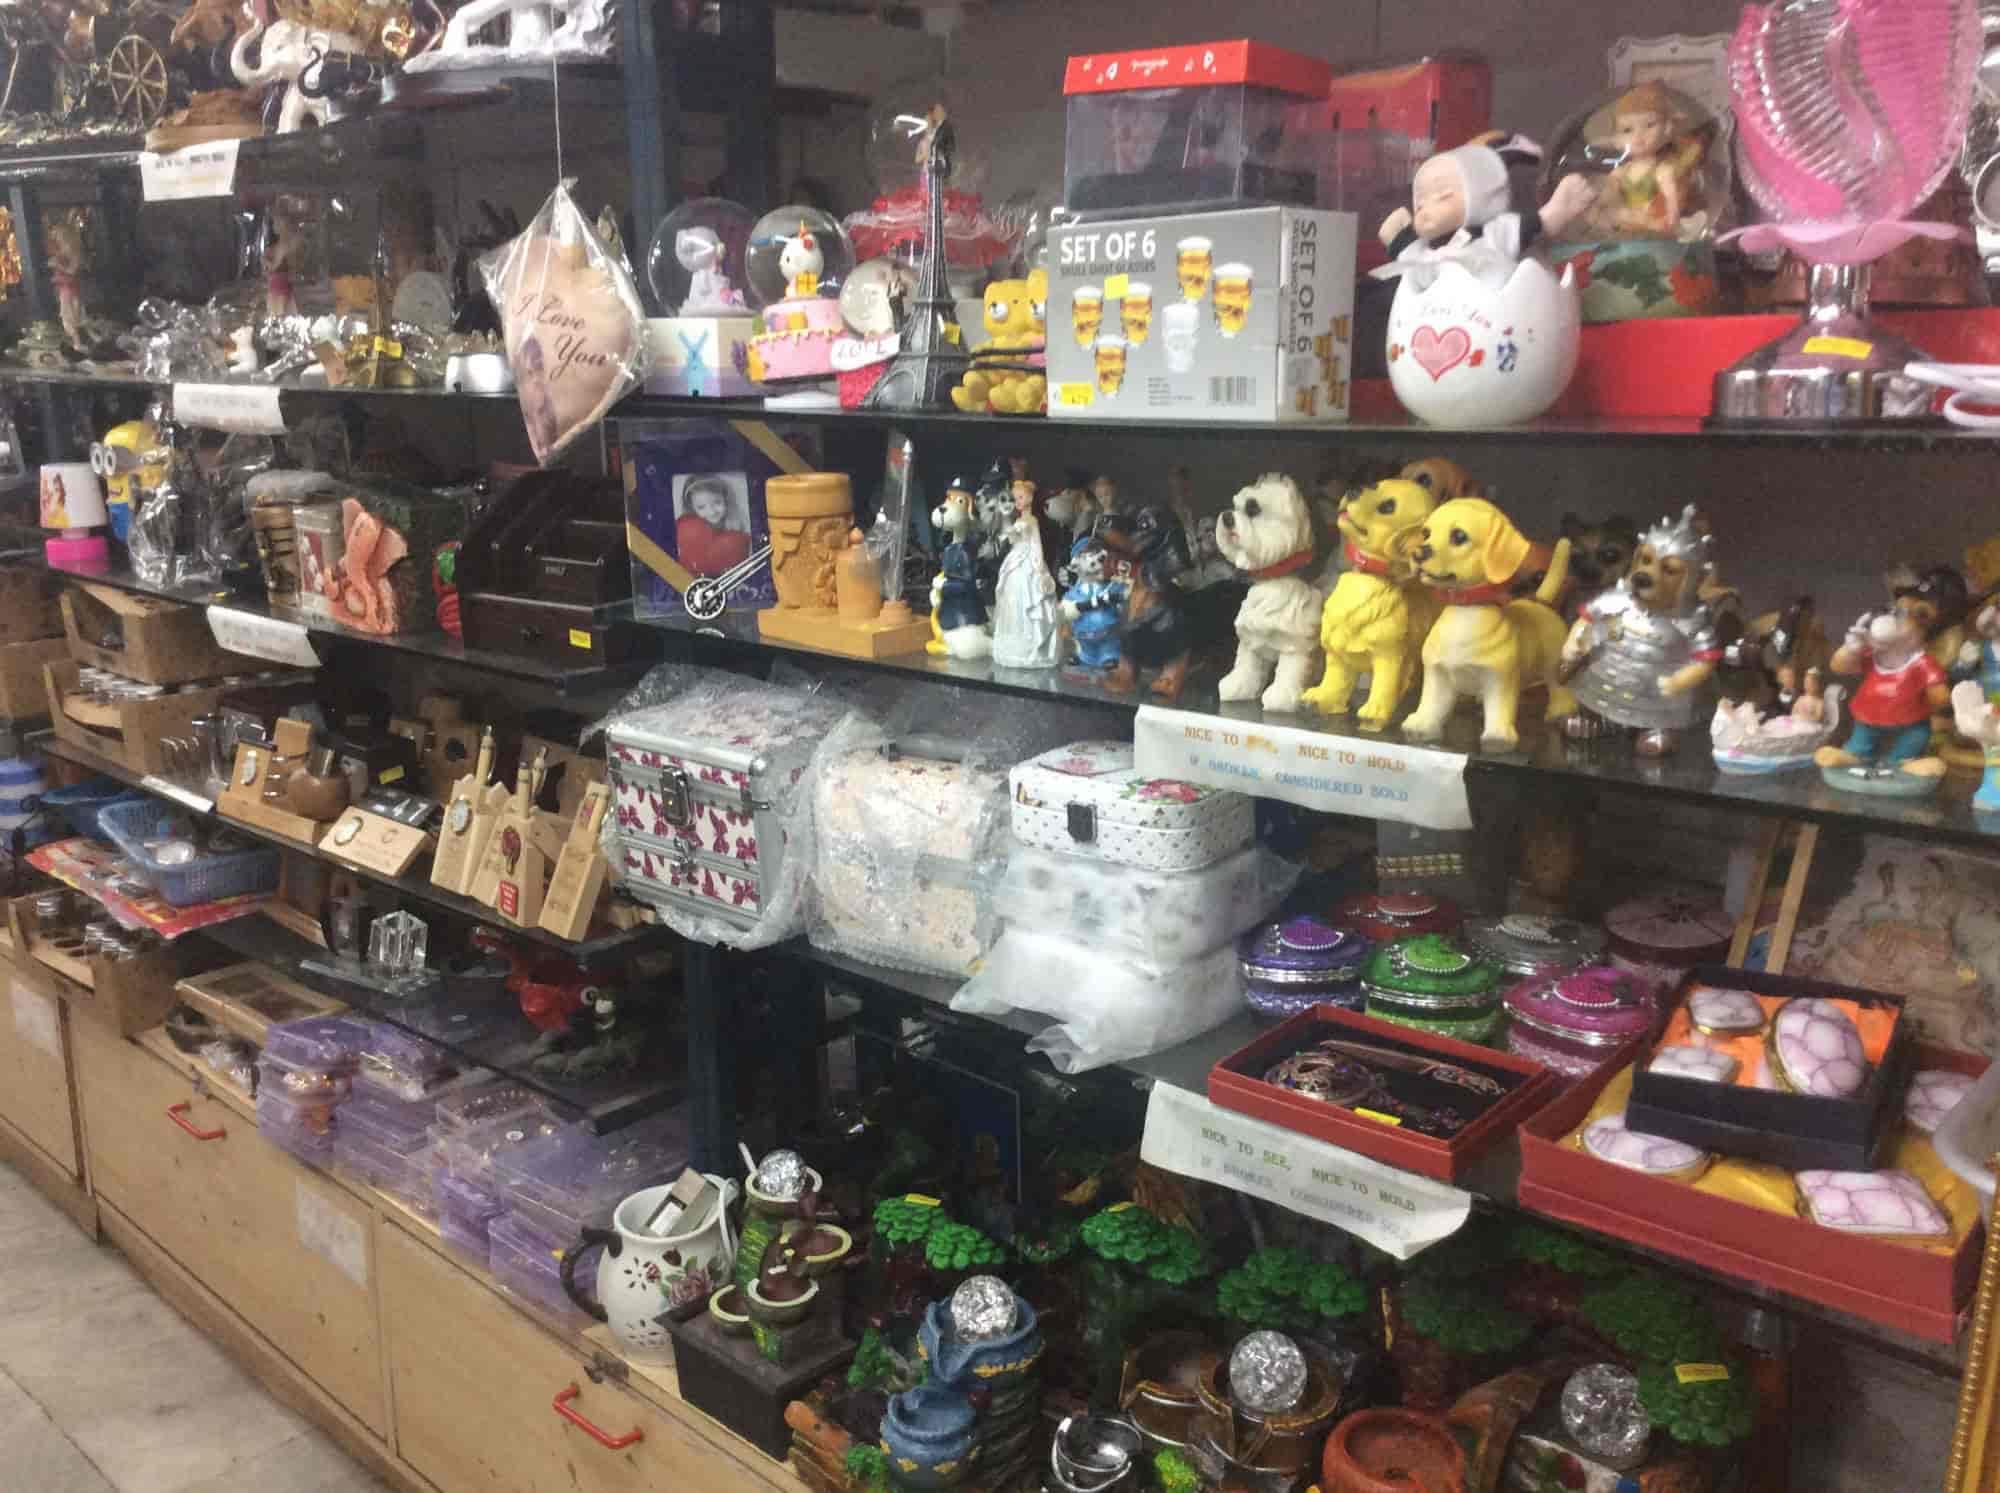 Hallmark Gift Shop Photos, Vile Parle East, Mumbai- Pictures ...